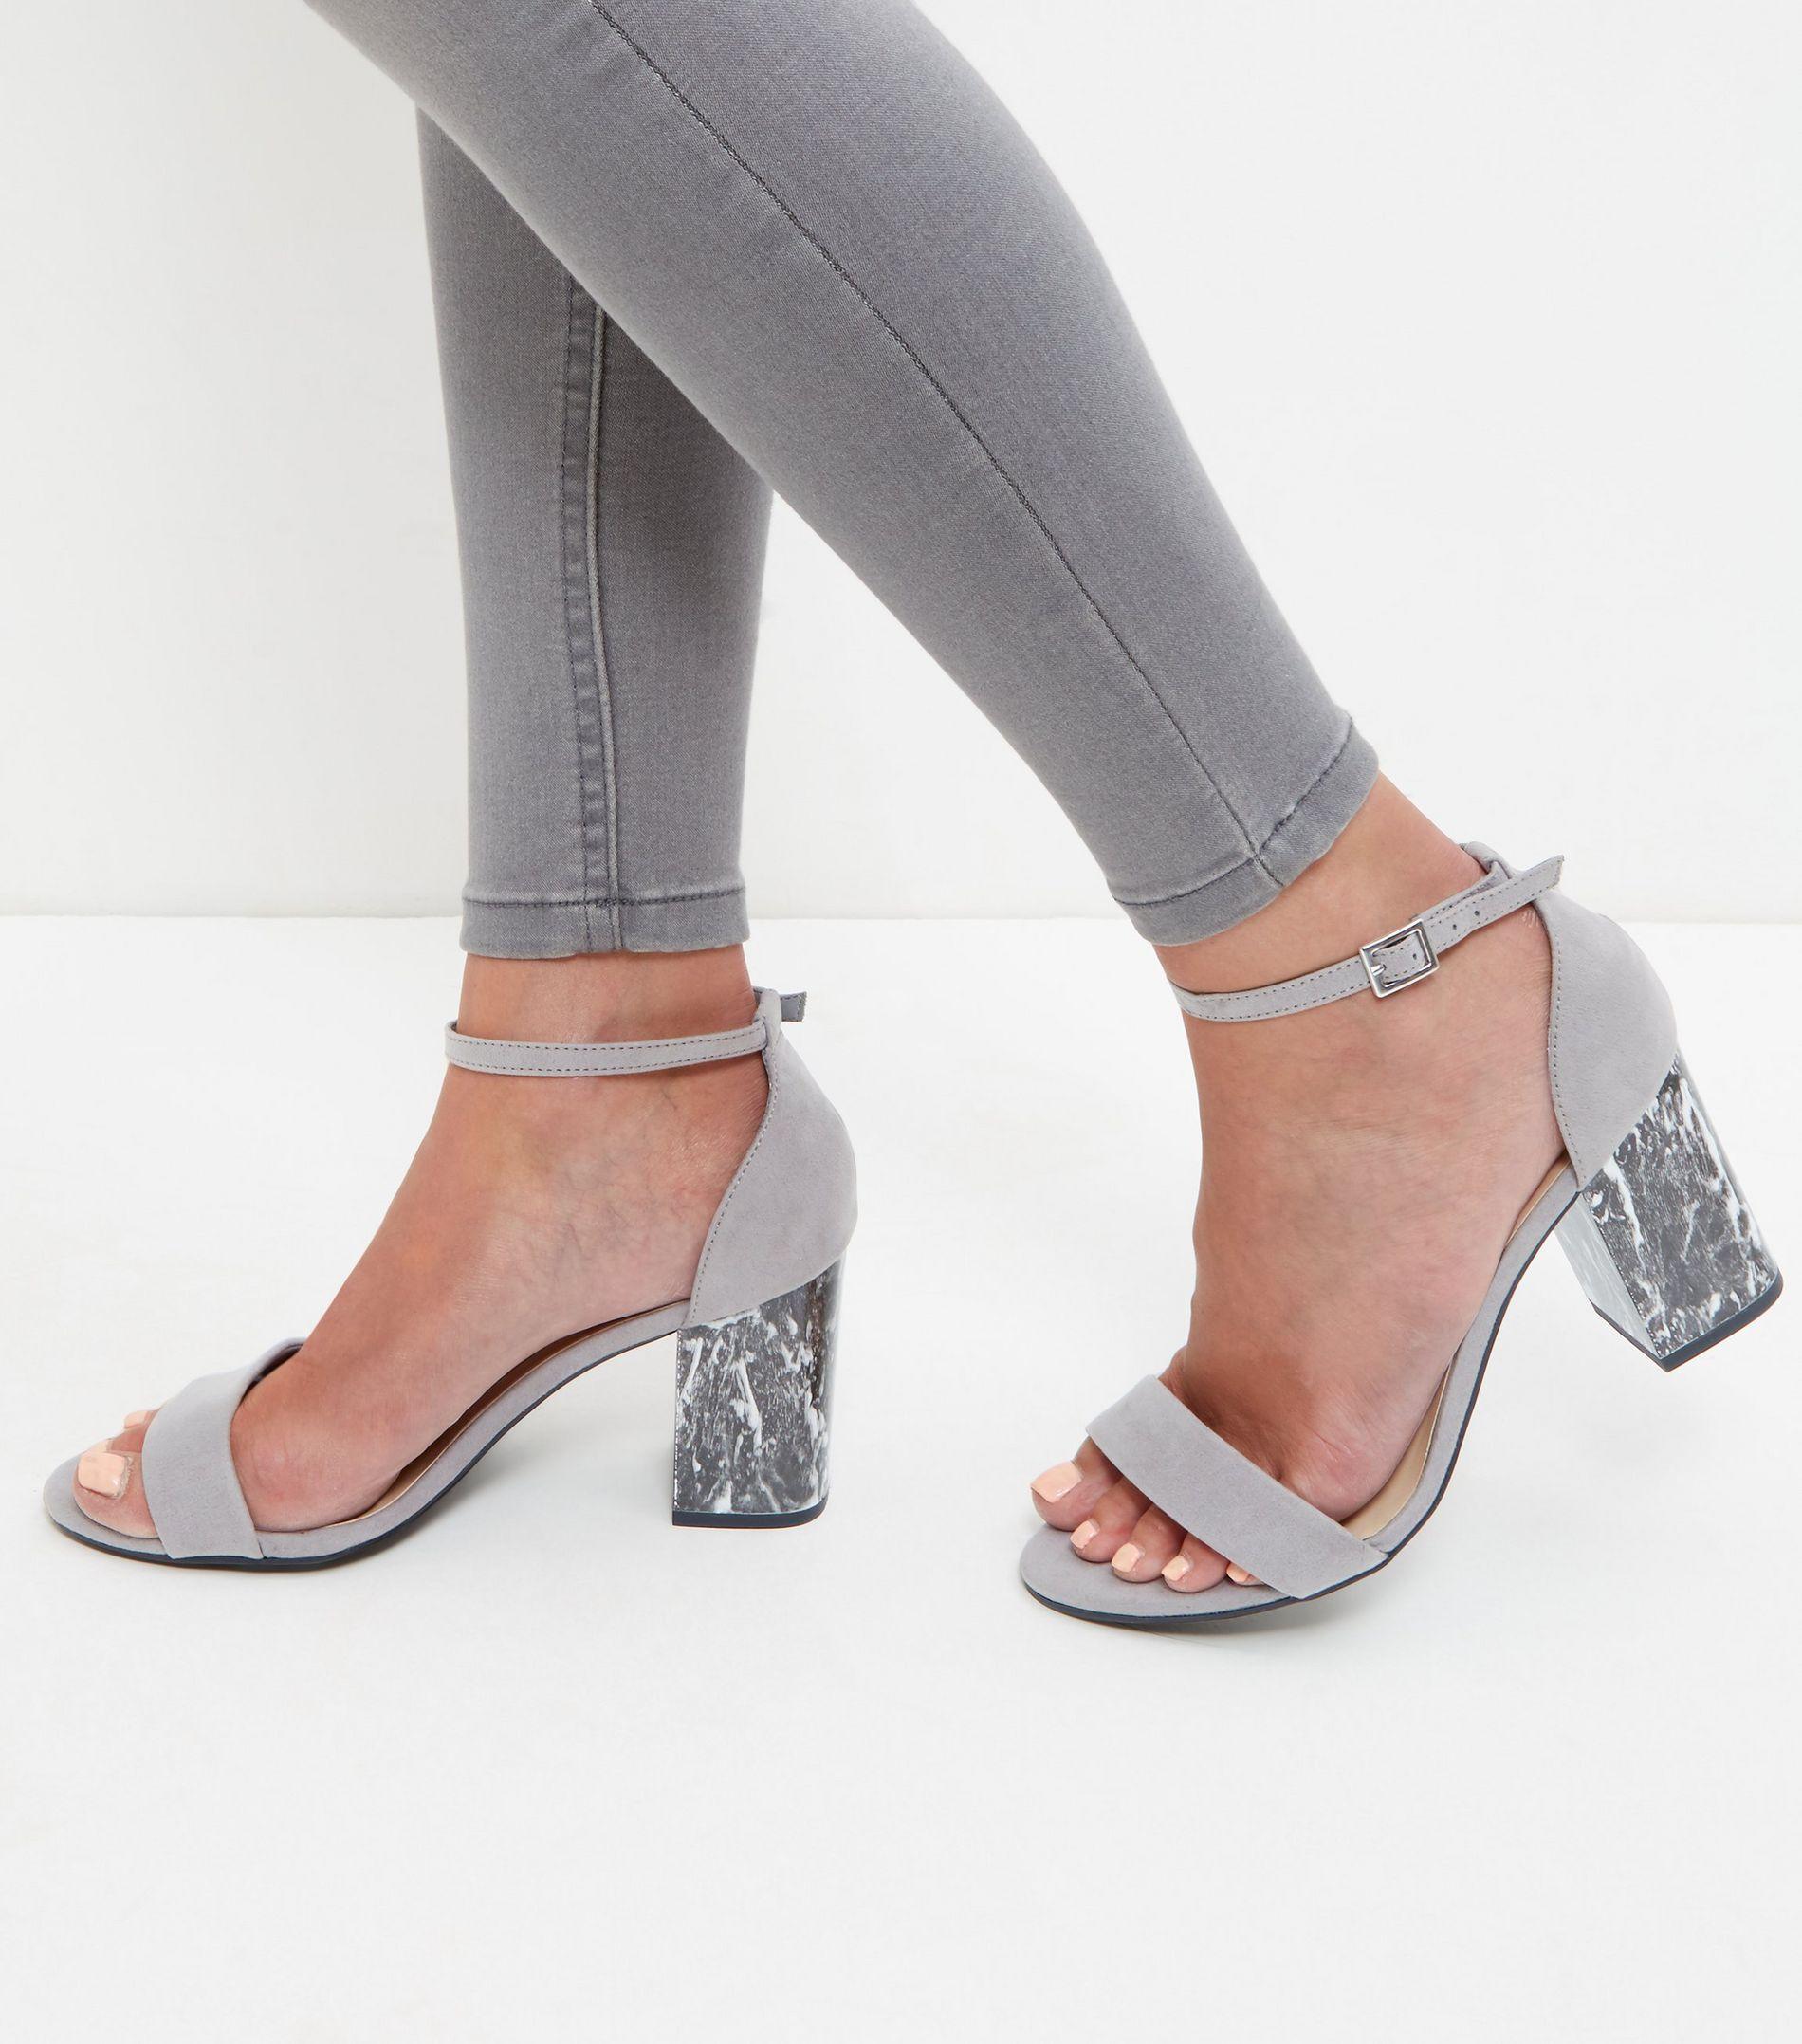 8b587b2d9f08 New Look Wide Fit Grey Marble Block Heels in Gray - Lyst